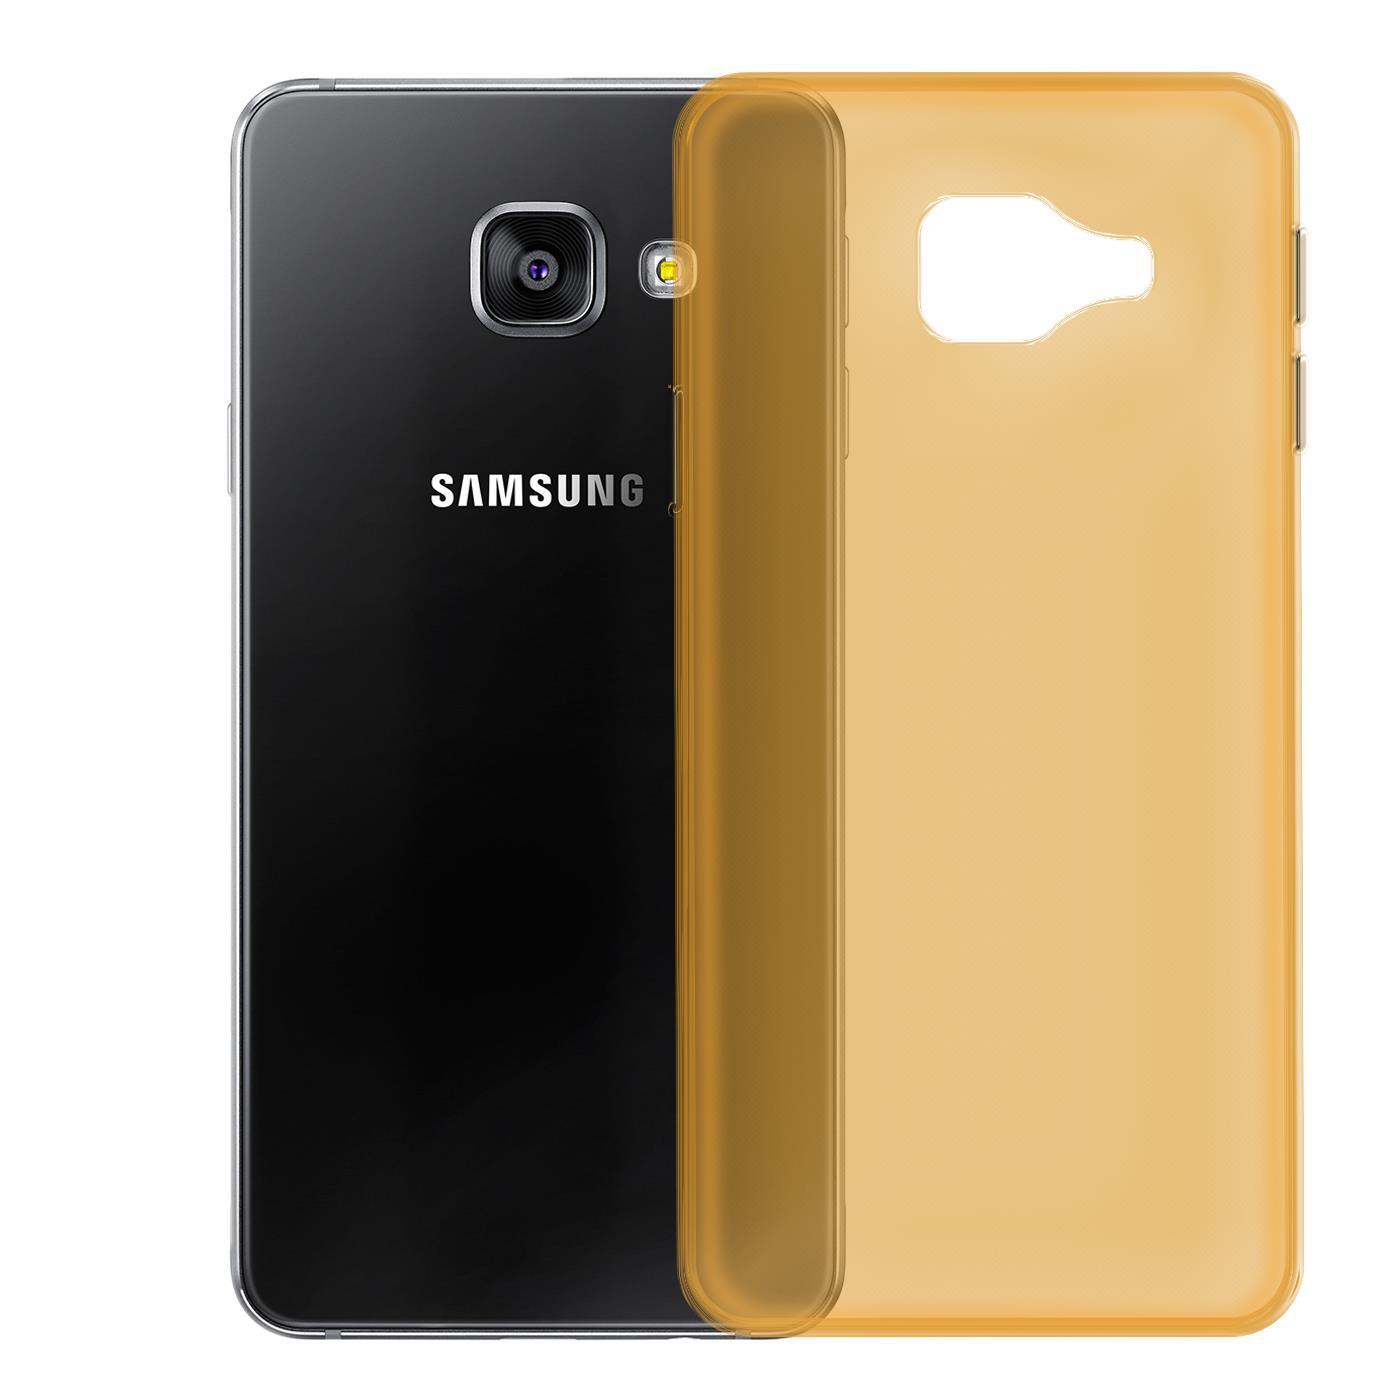 Samsung-Galaxy-a3-2016-Thin-Silikon-Klar-Case-Cover-Ultra-Slim-Stossfeste-Gel Indexbild 16